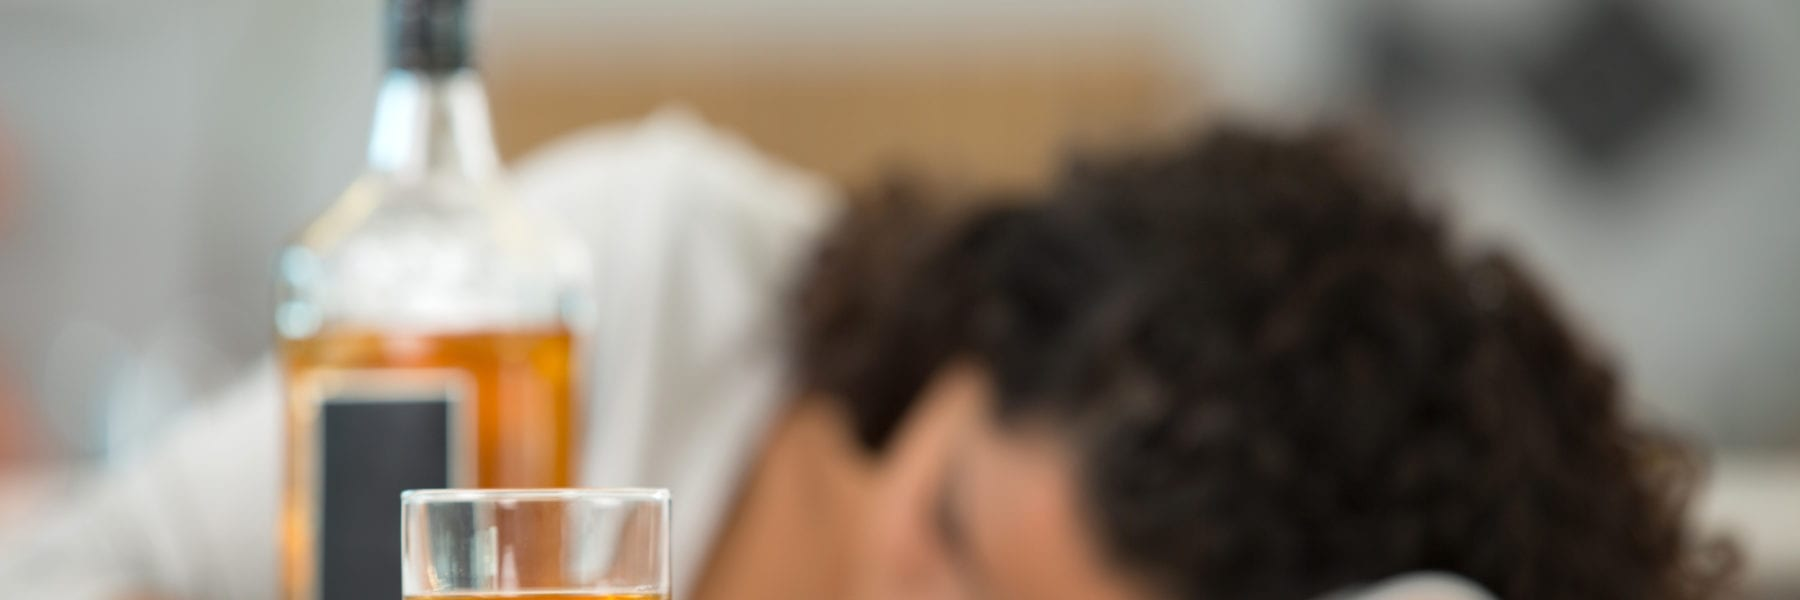 woman addiction alcohol